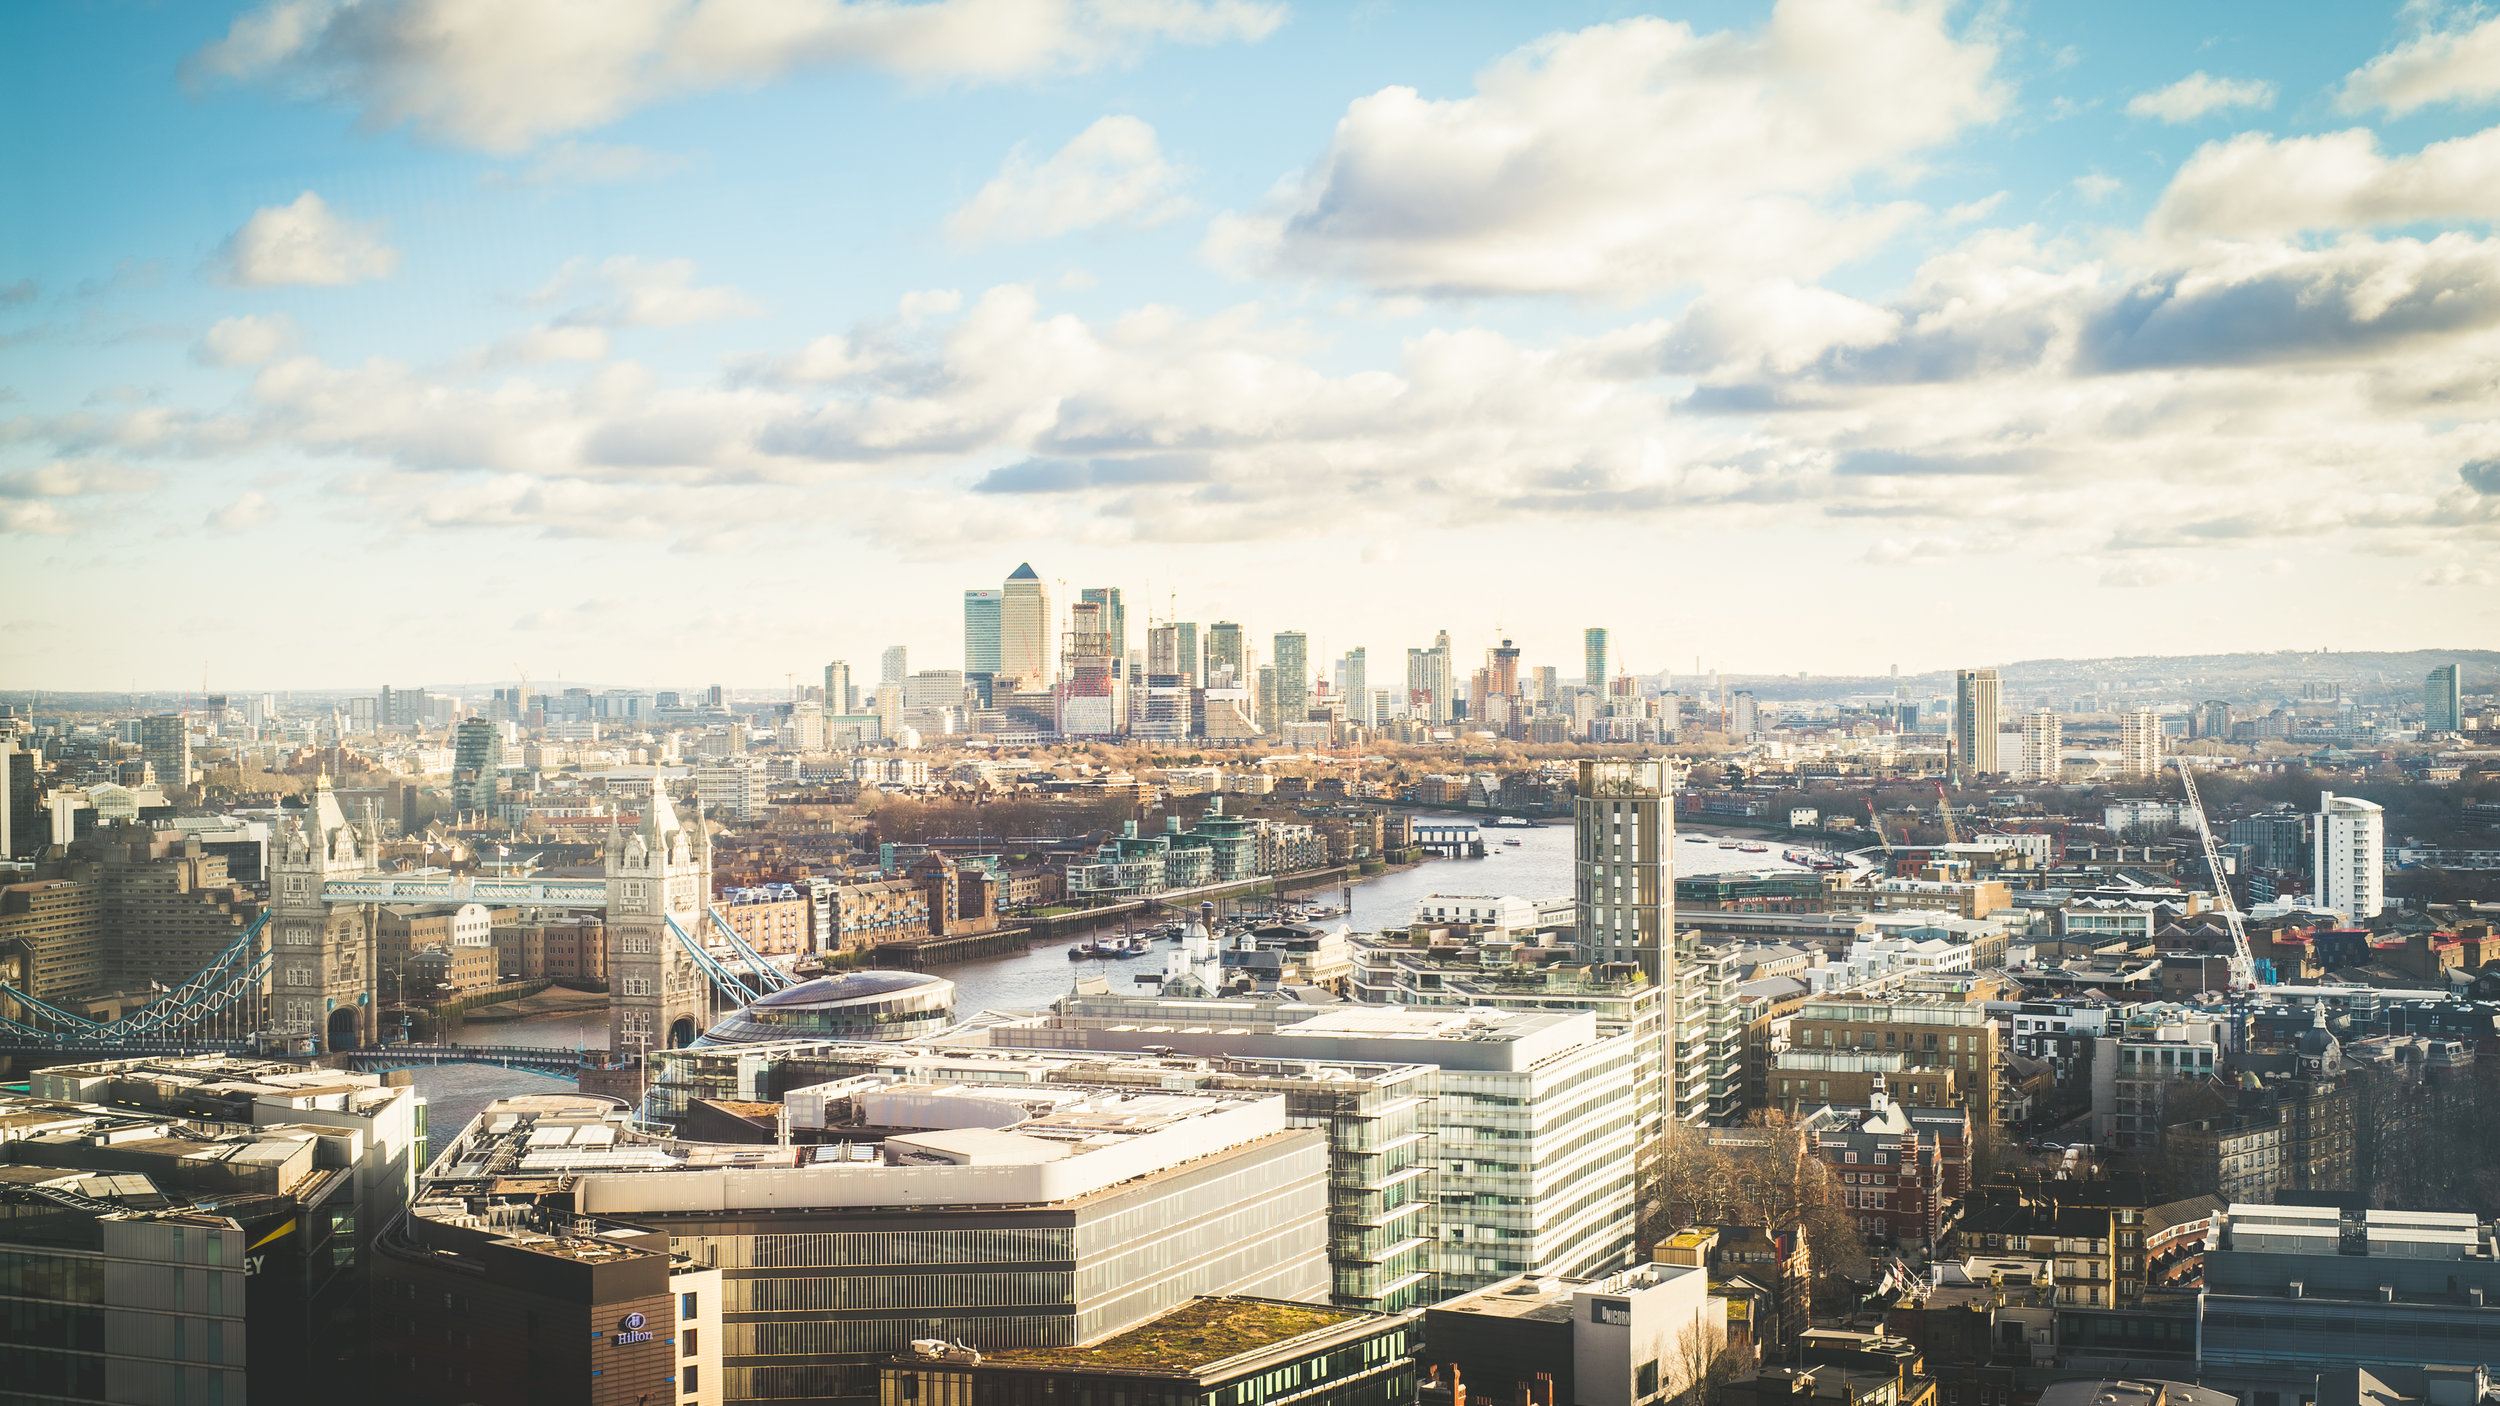 Shard London-1.jpg